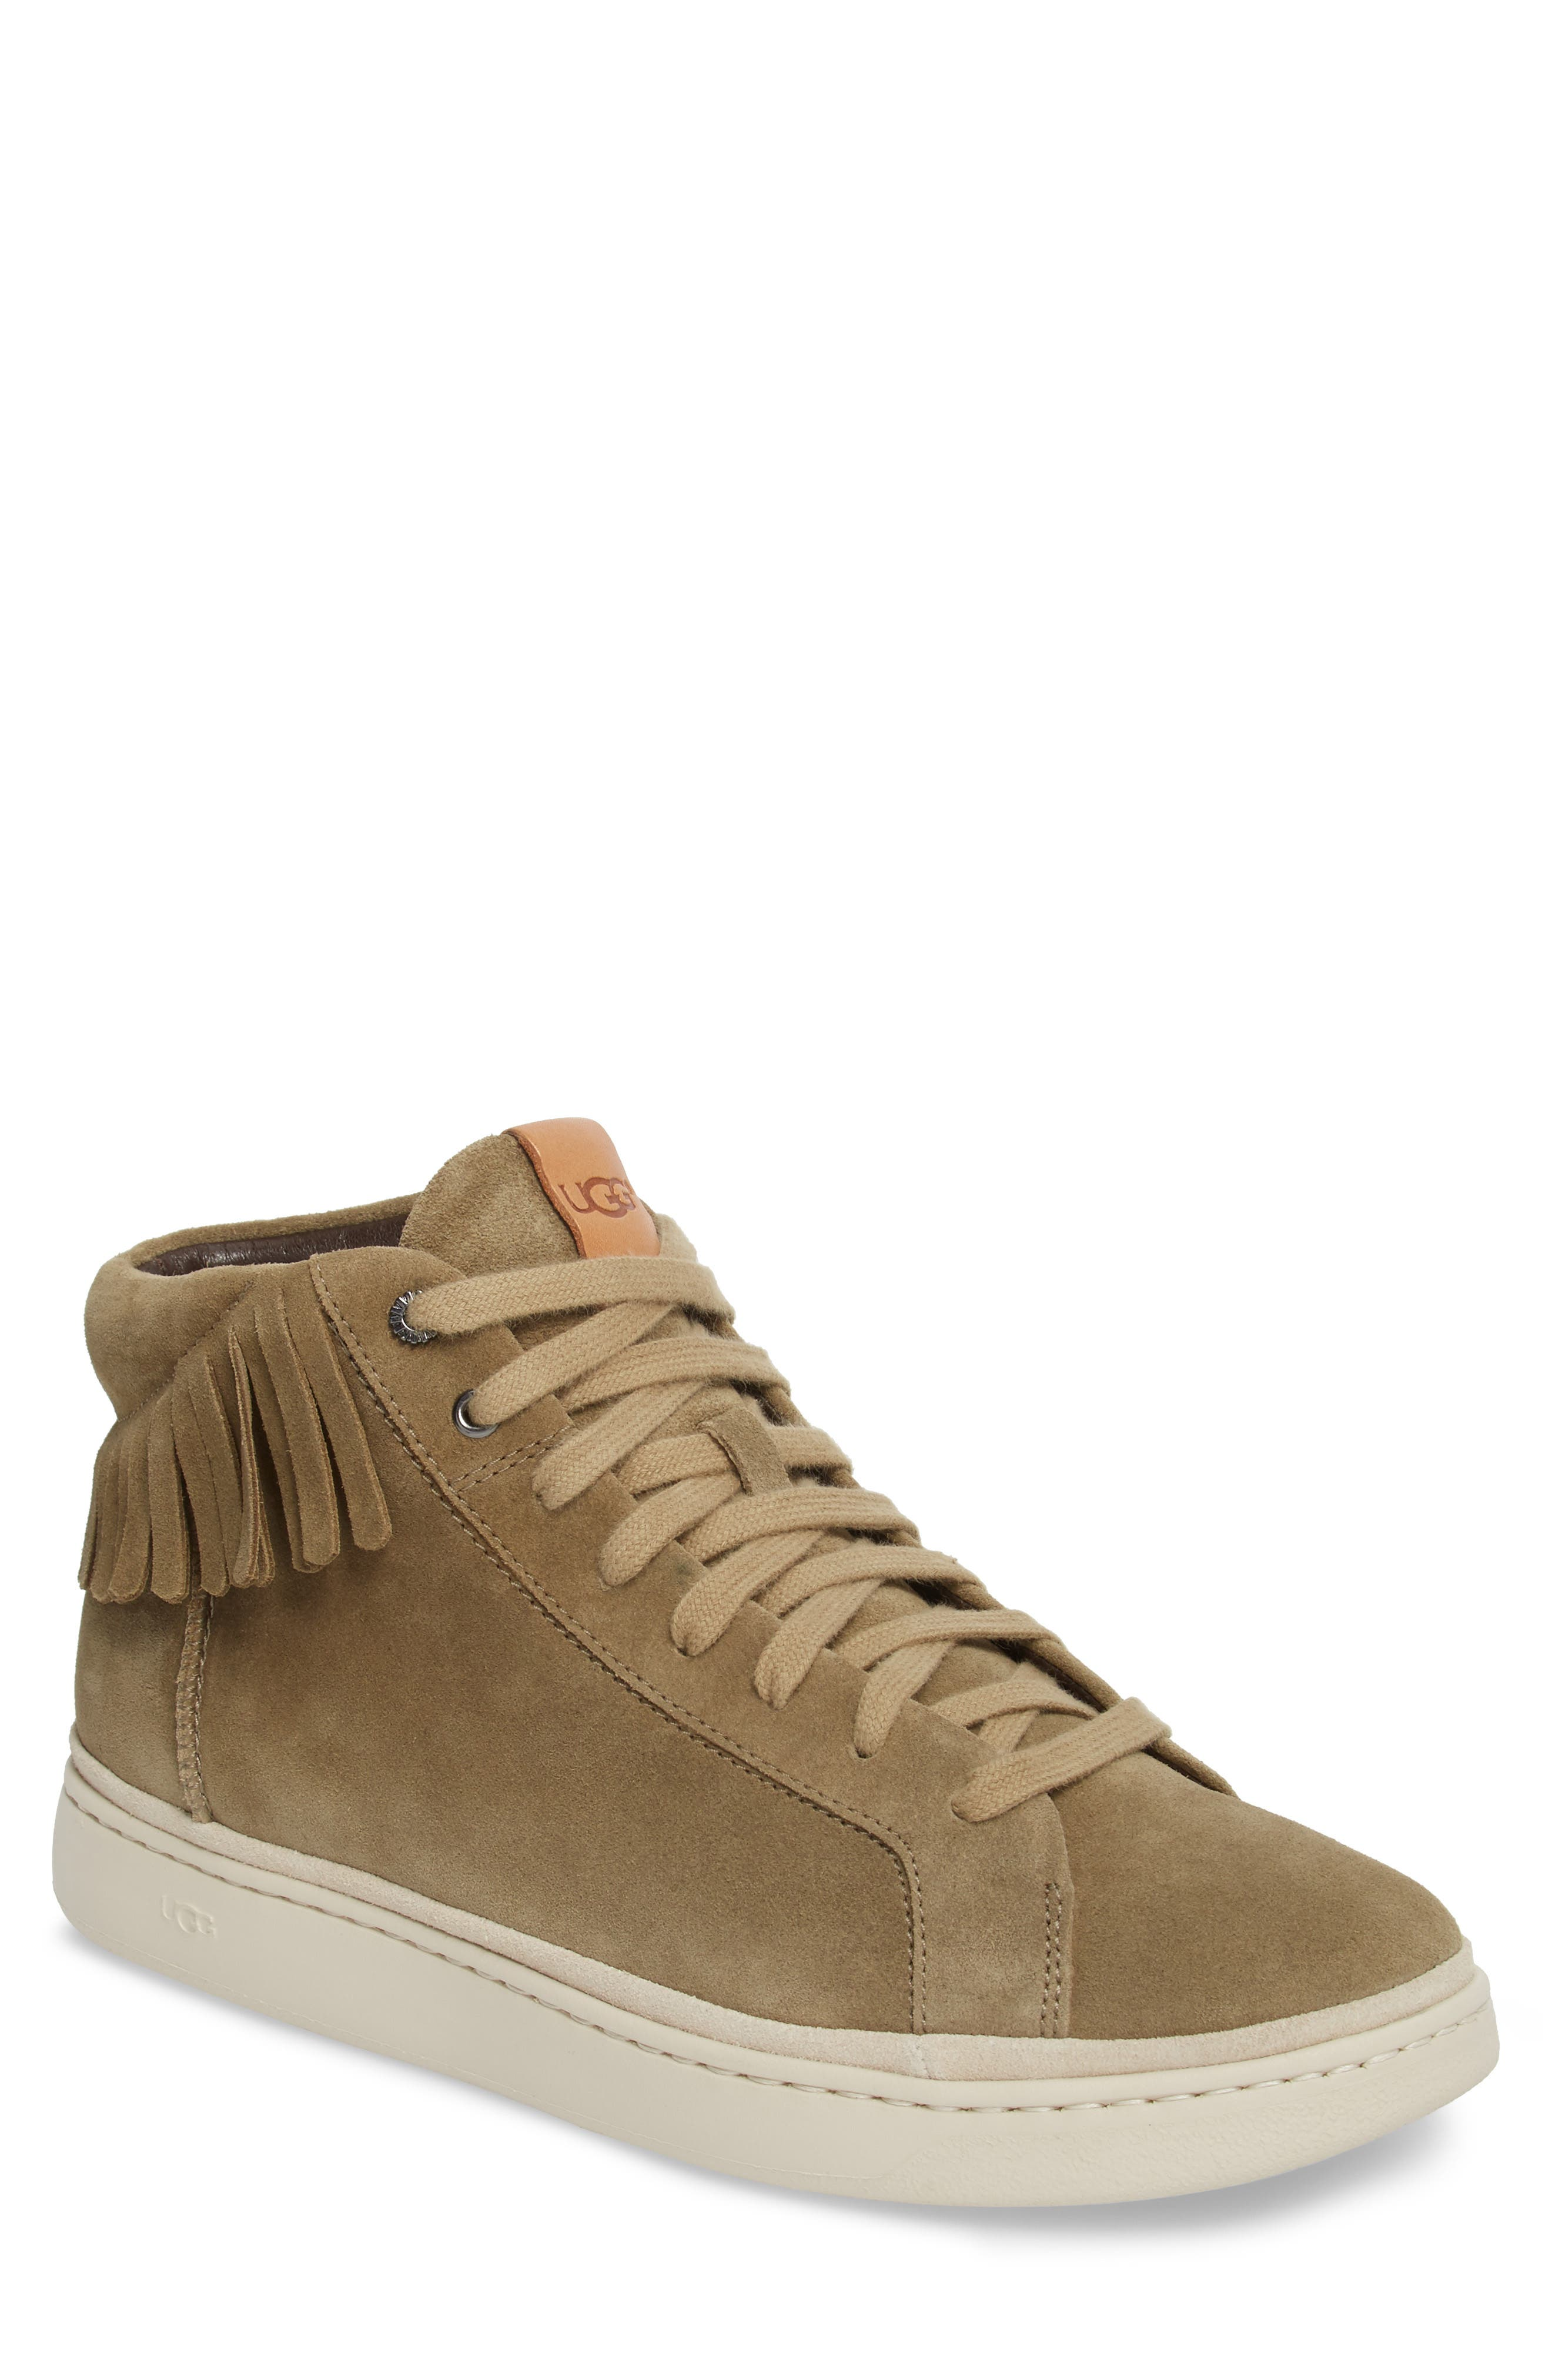 Brecken Fringe High-Top Sneaker,                             Main thumbnail 1, color,                             204